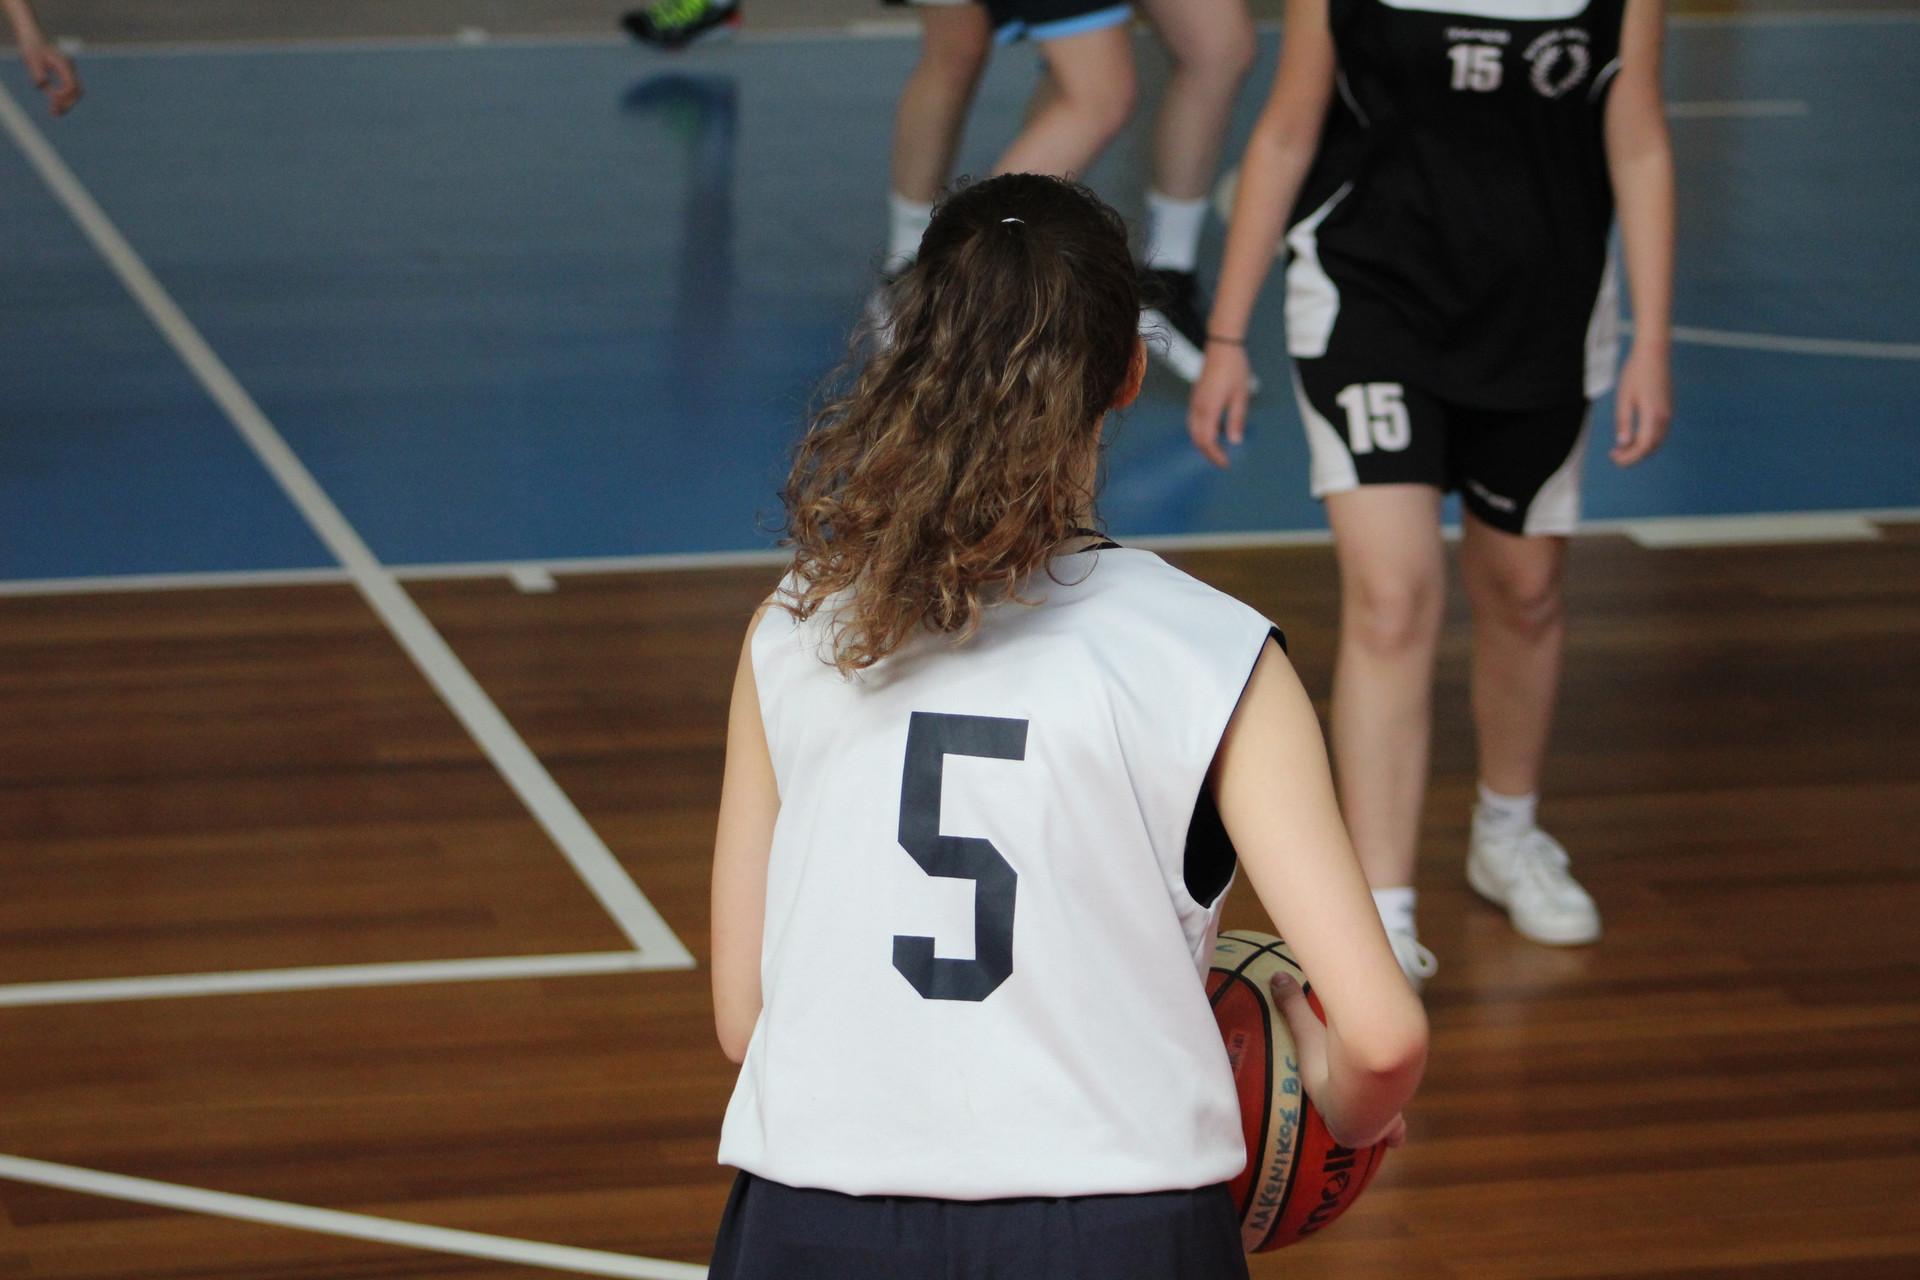 super-league-athletic-academy-athens-tour-2019-day-1_33801185858_o